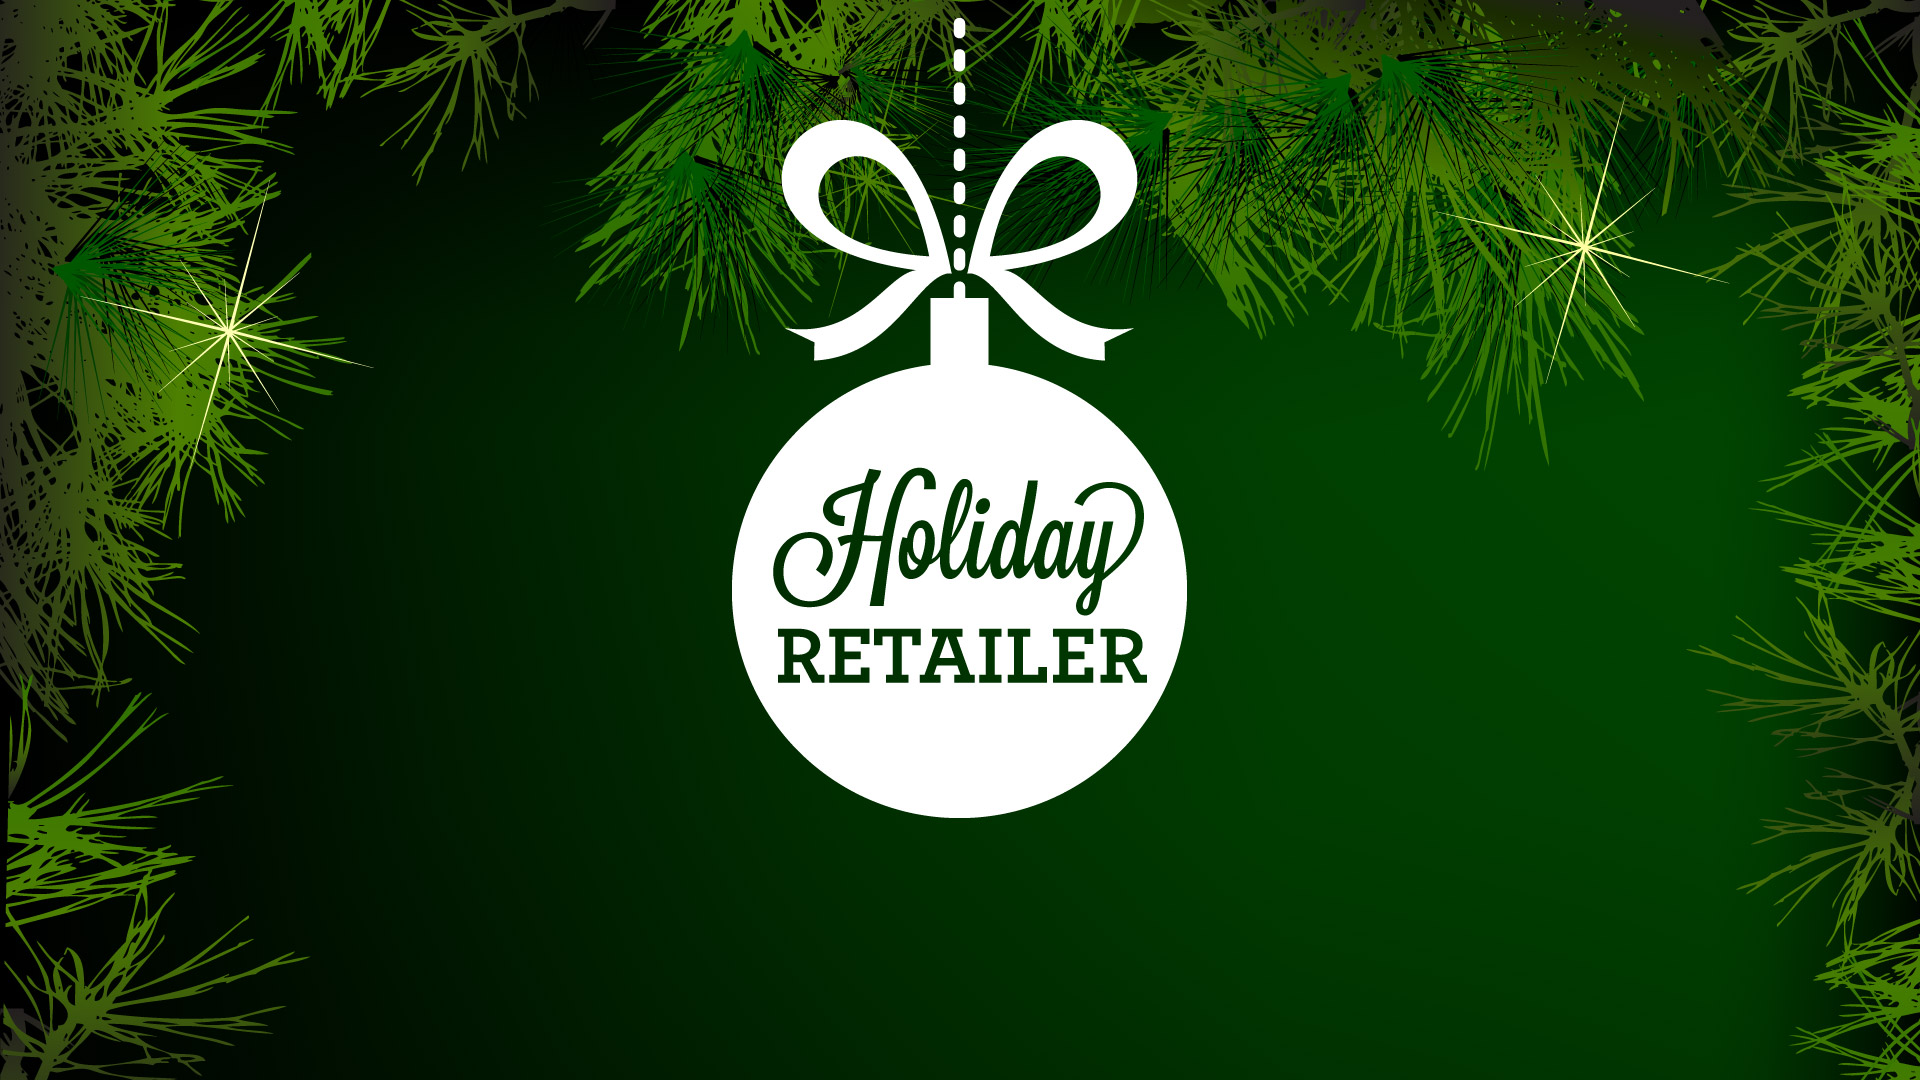 holiday-retailer2016g-ss-1920